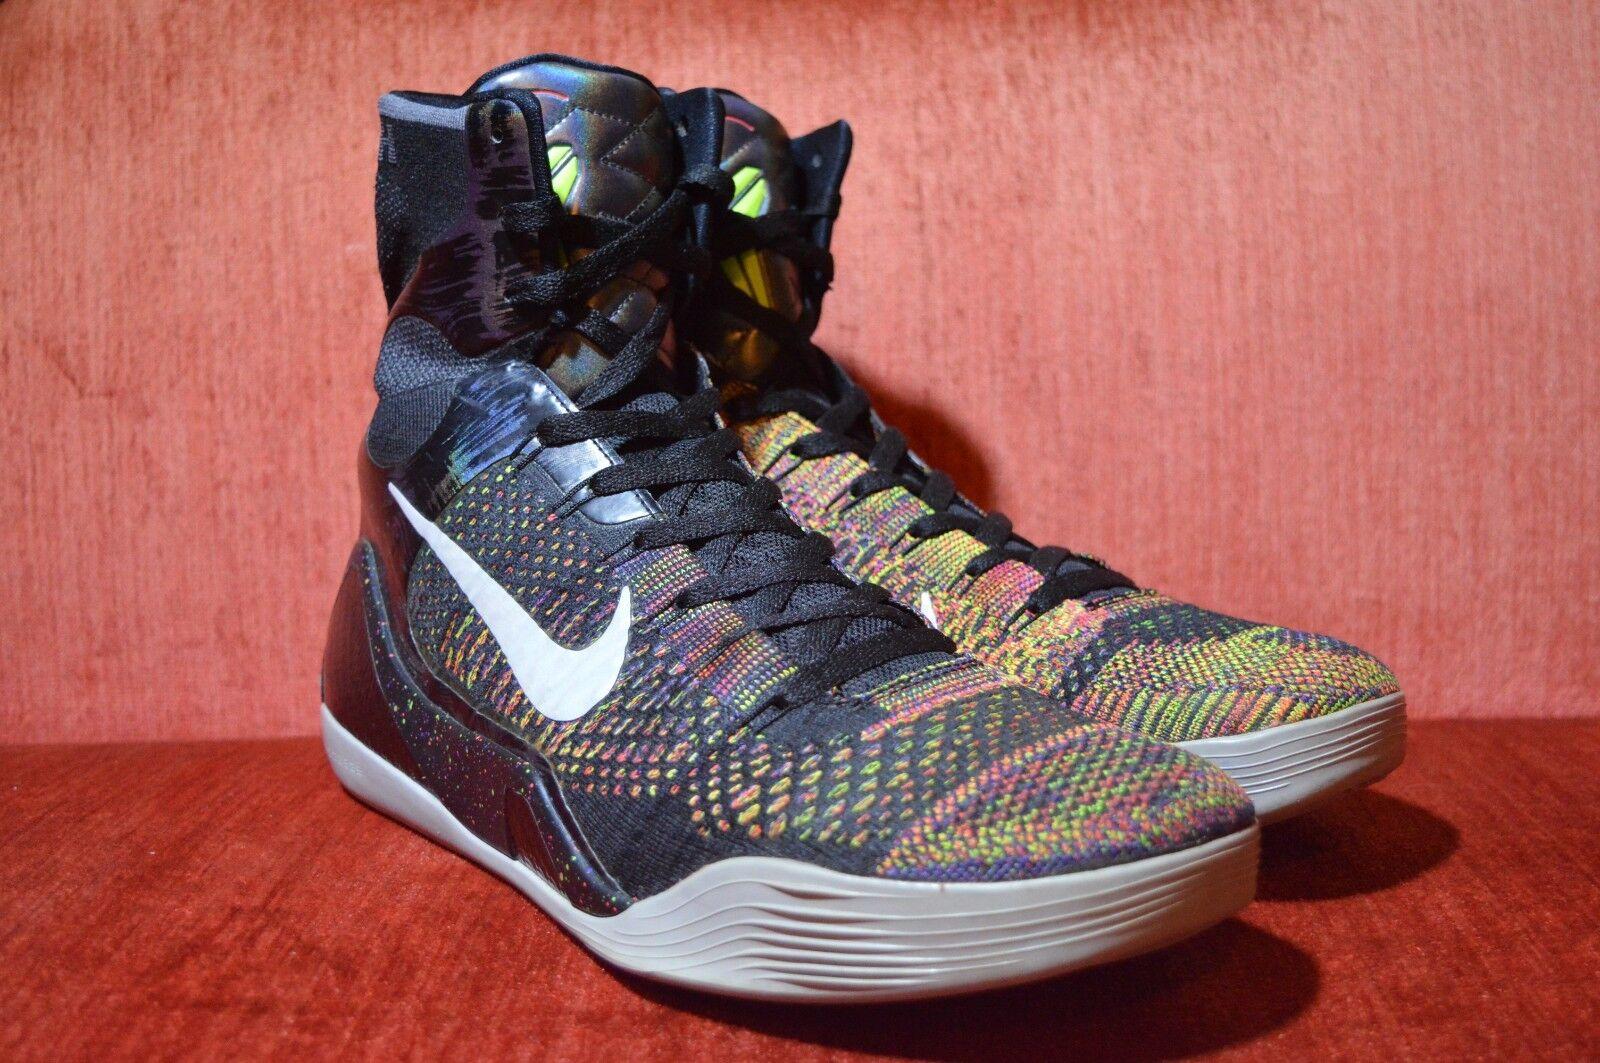 Nike Kobe 9 IX Elite Masterpiece Size 13 630847-001 jordan htm what the bhm x